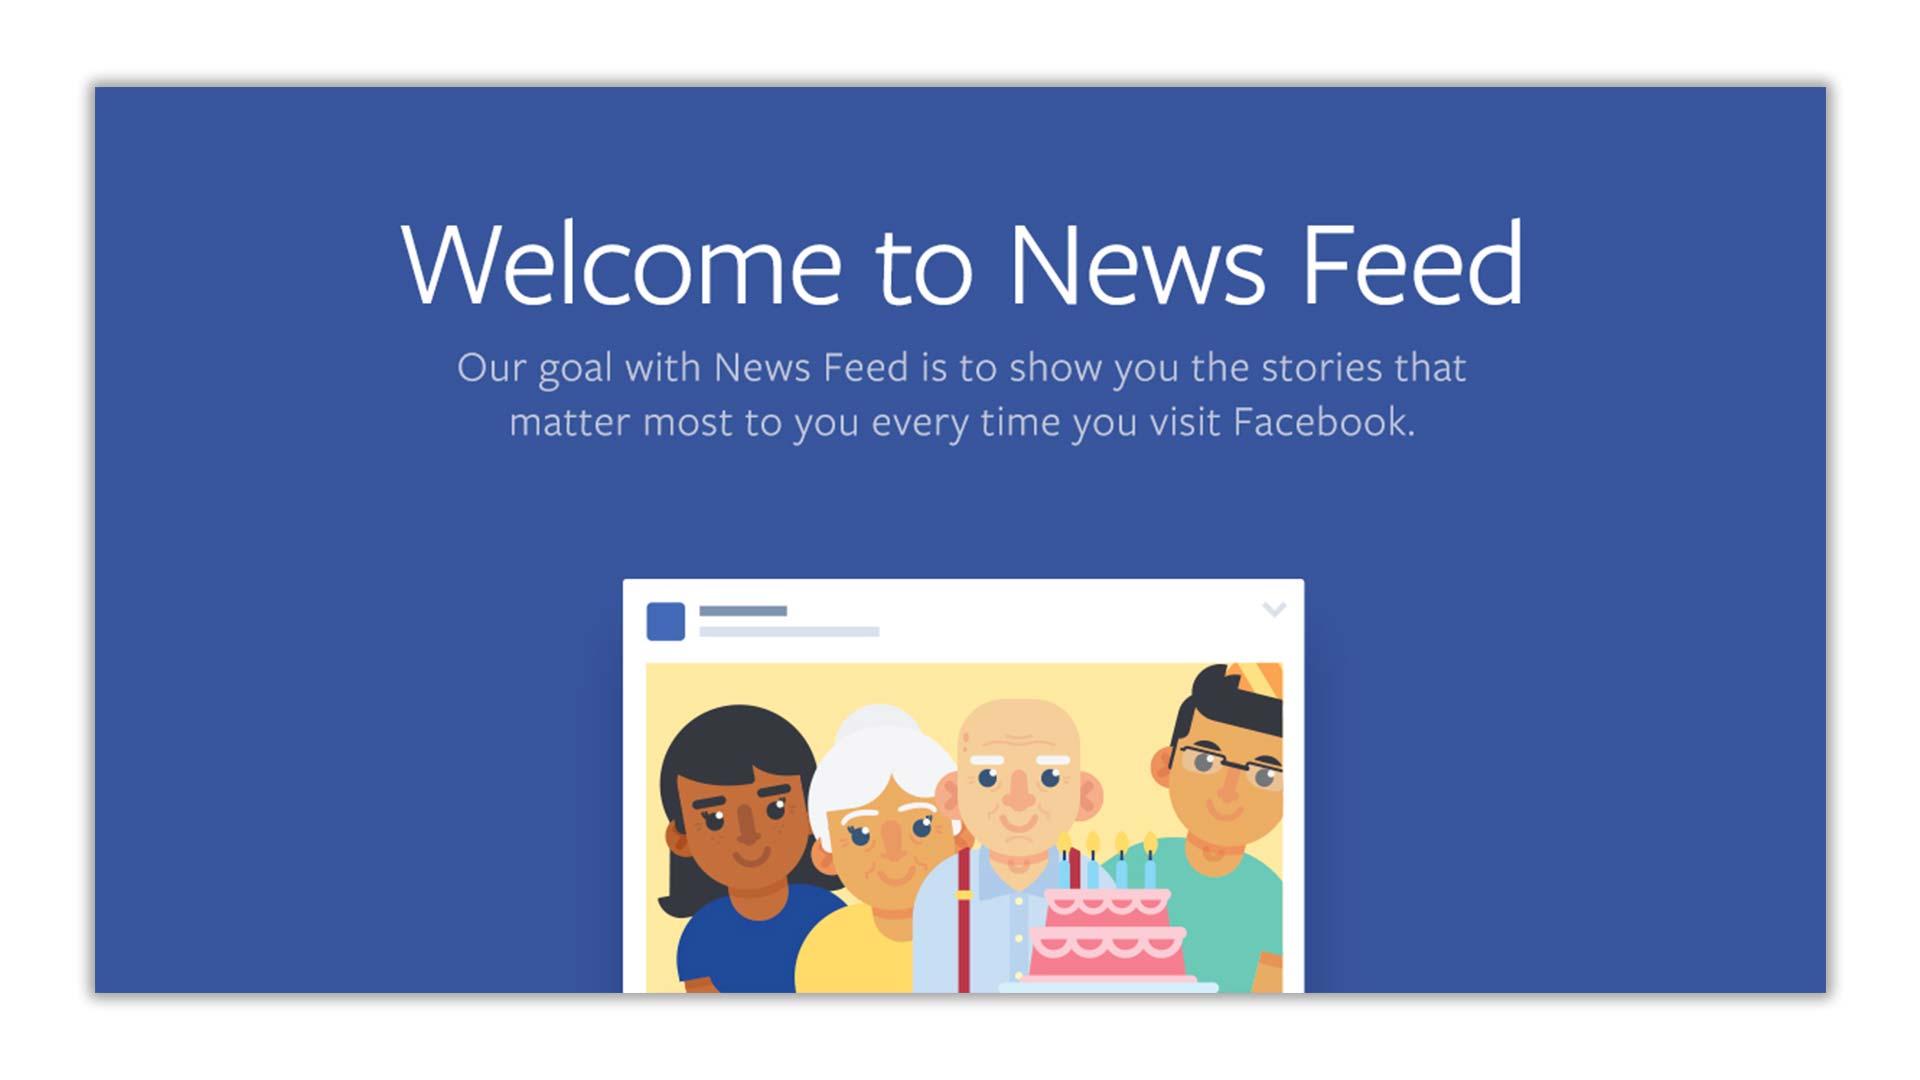 """News"